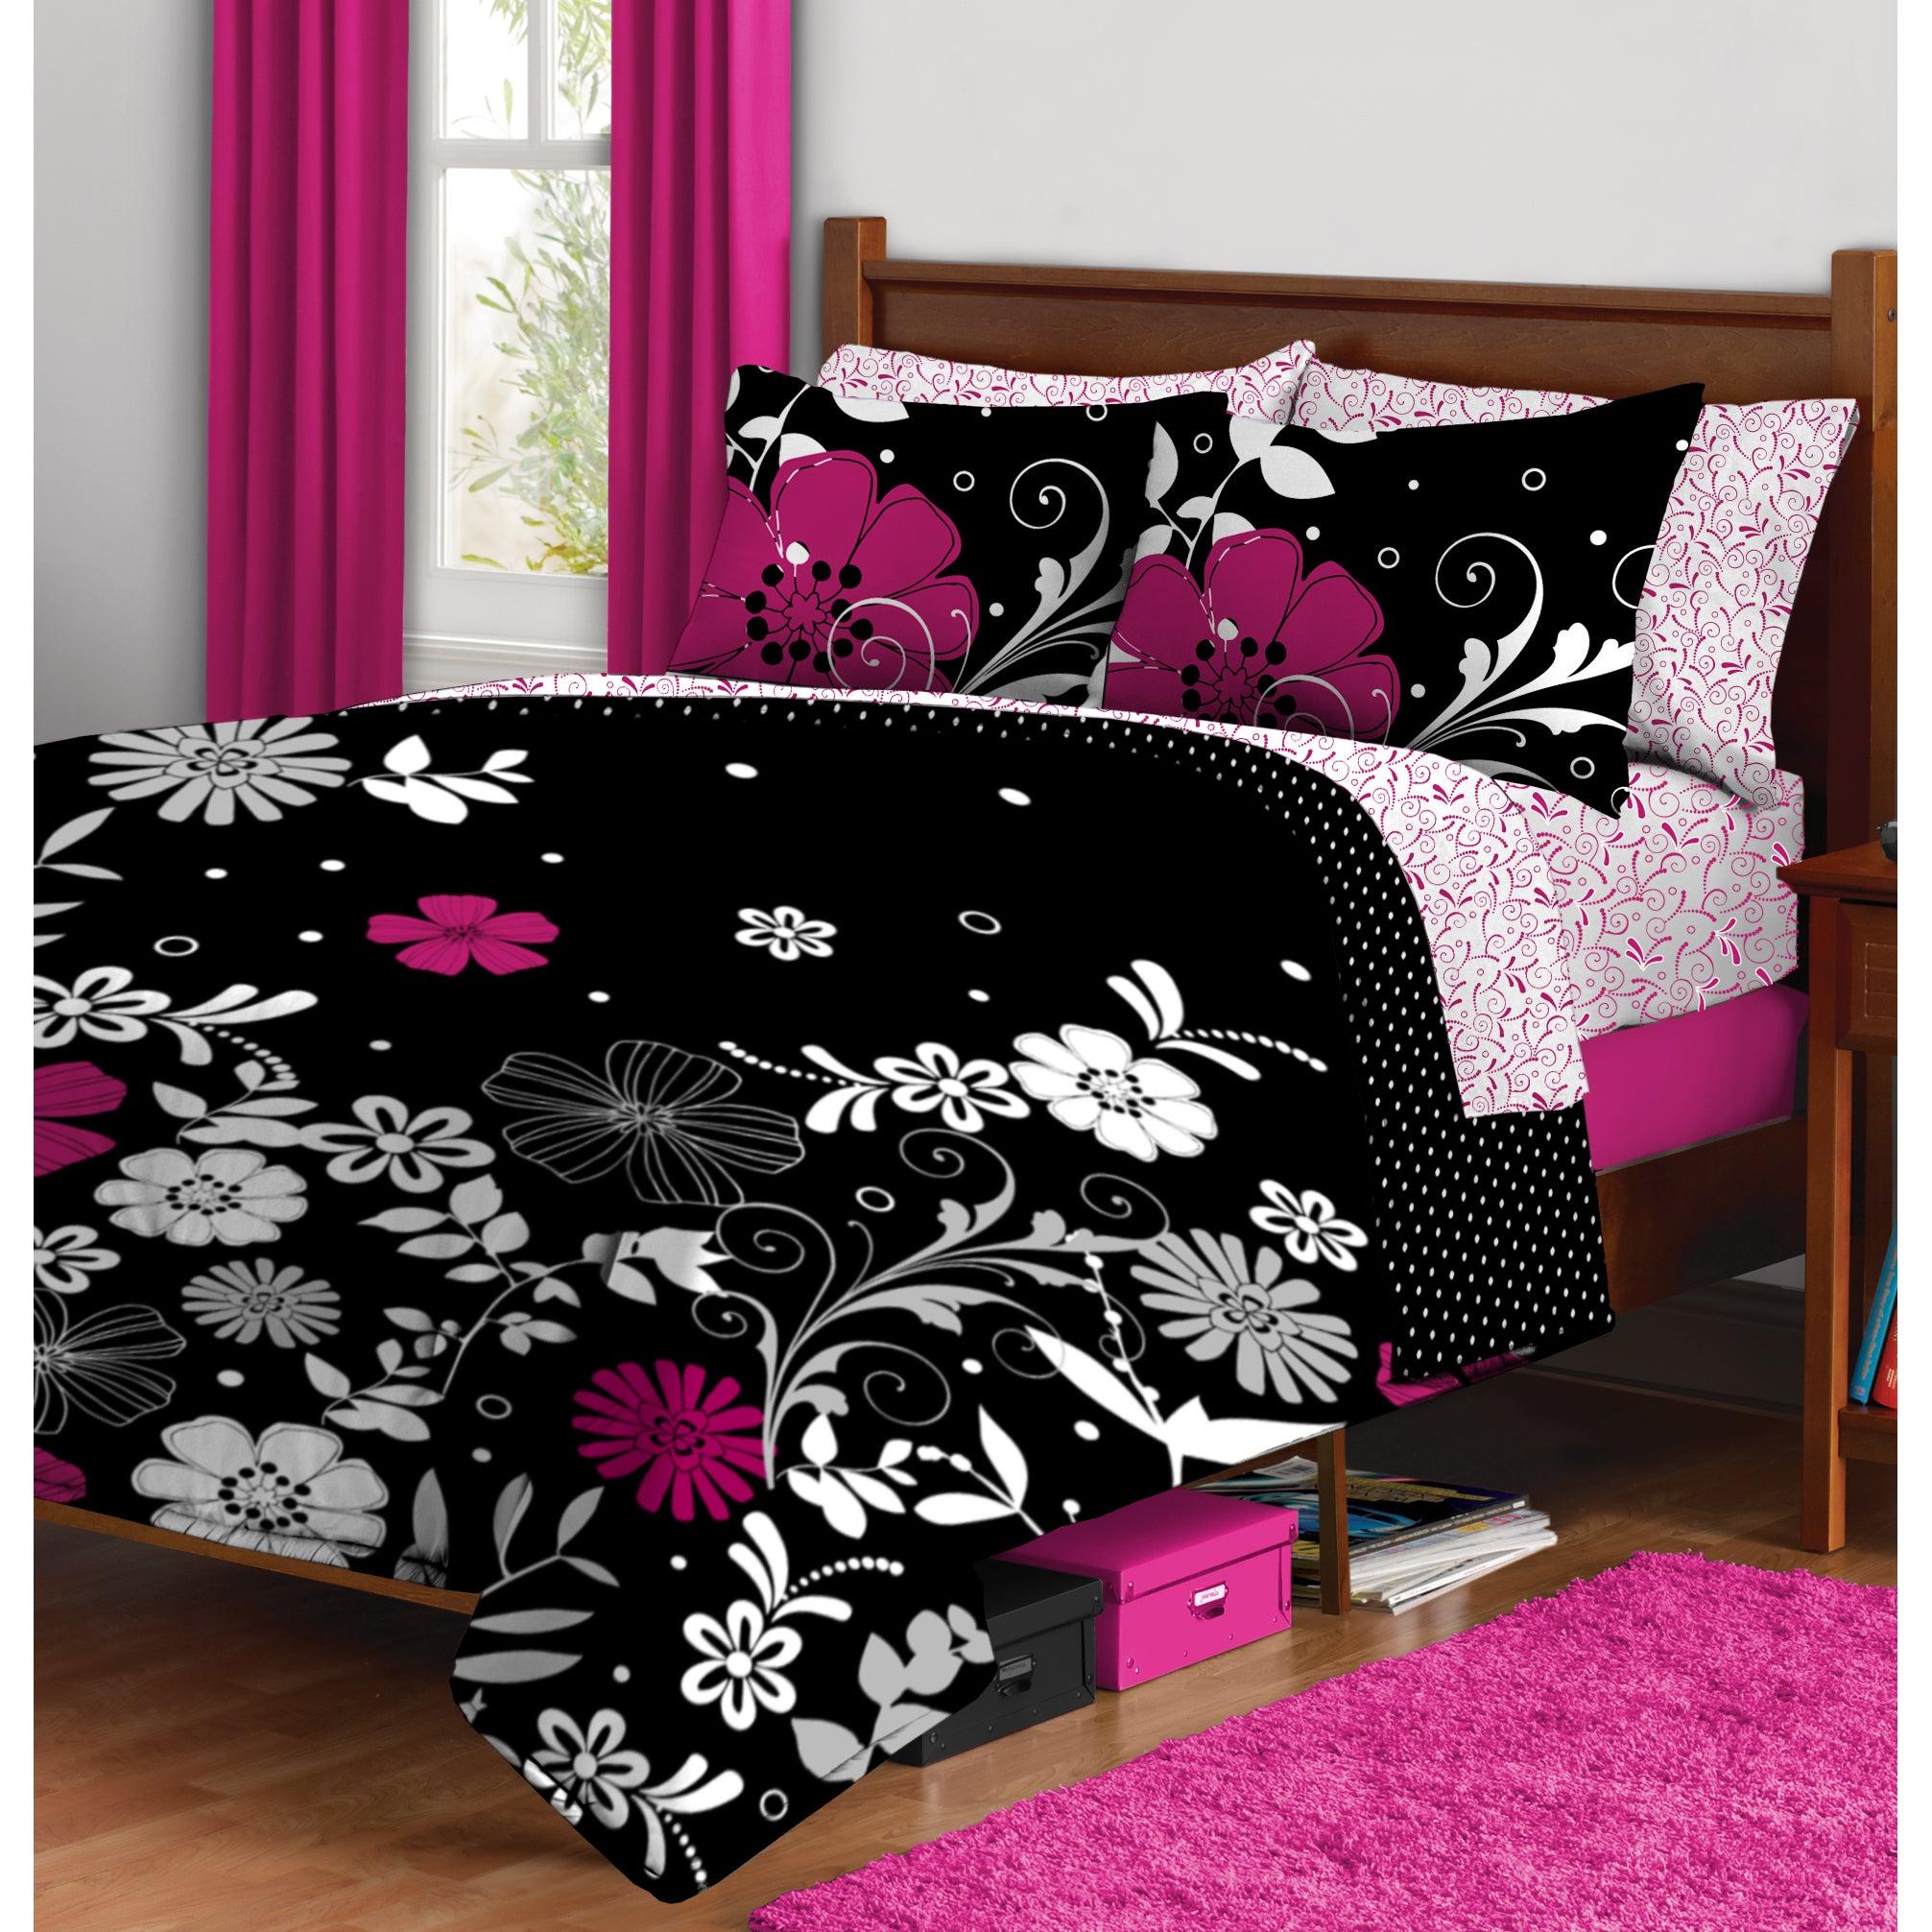 Twilight Games Formula Twilight Garden 7-piece Bed in a B...